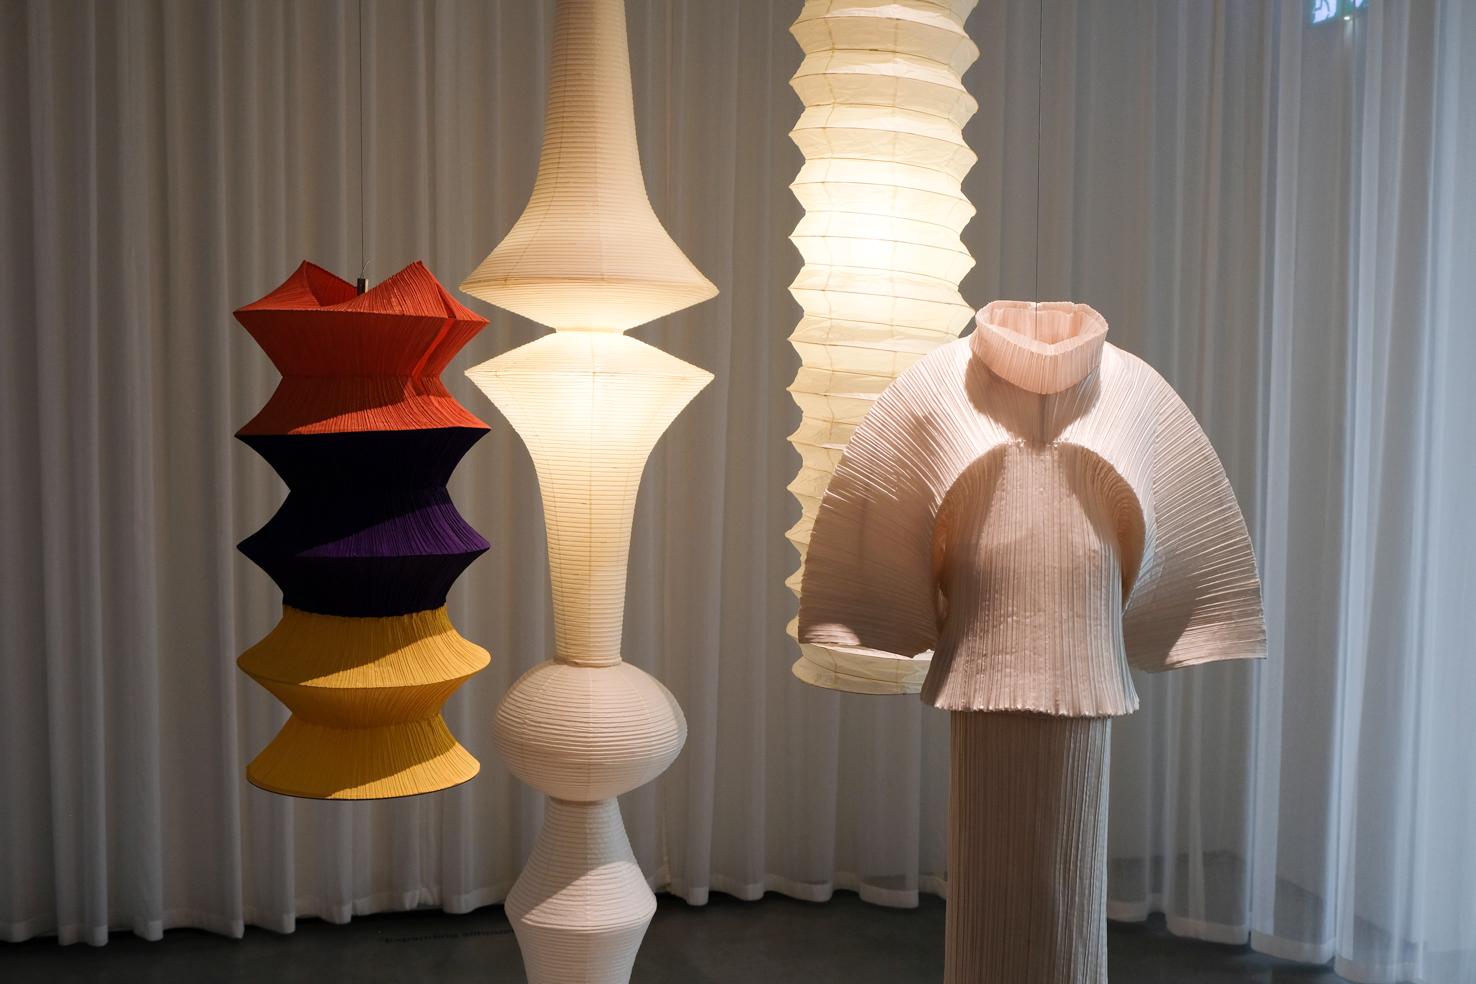 18 Isamu Noguchi Akari Lamp issey miyake Latern Dress